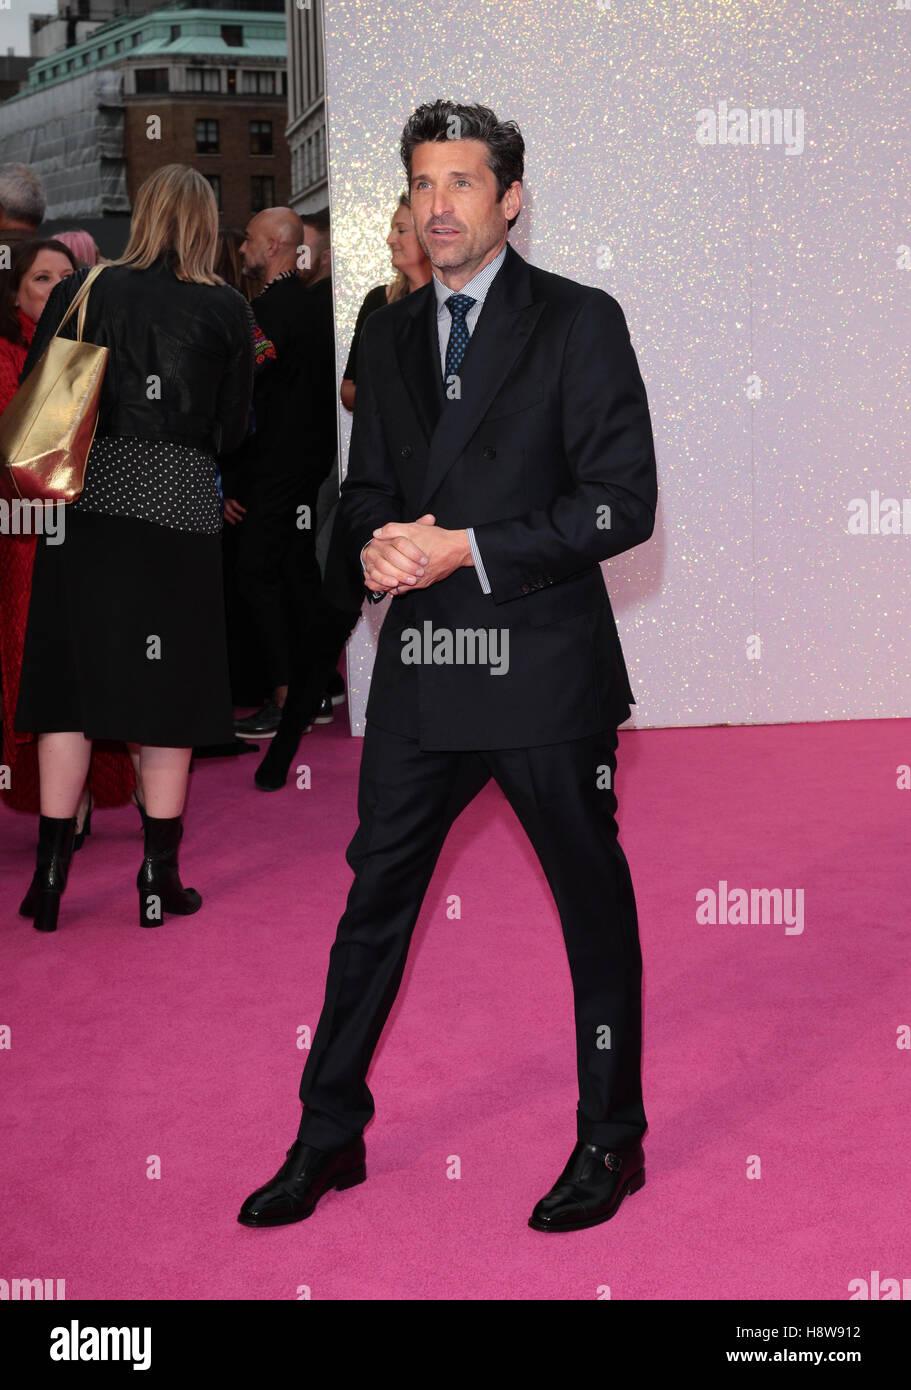 Patrick Dempsey attends Bridget Jone's Baby film premiere London on 05 Sep, 2016 - Stock Image